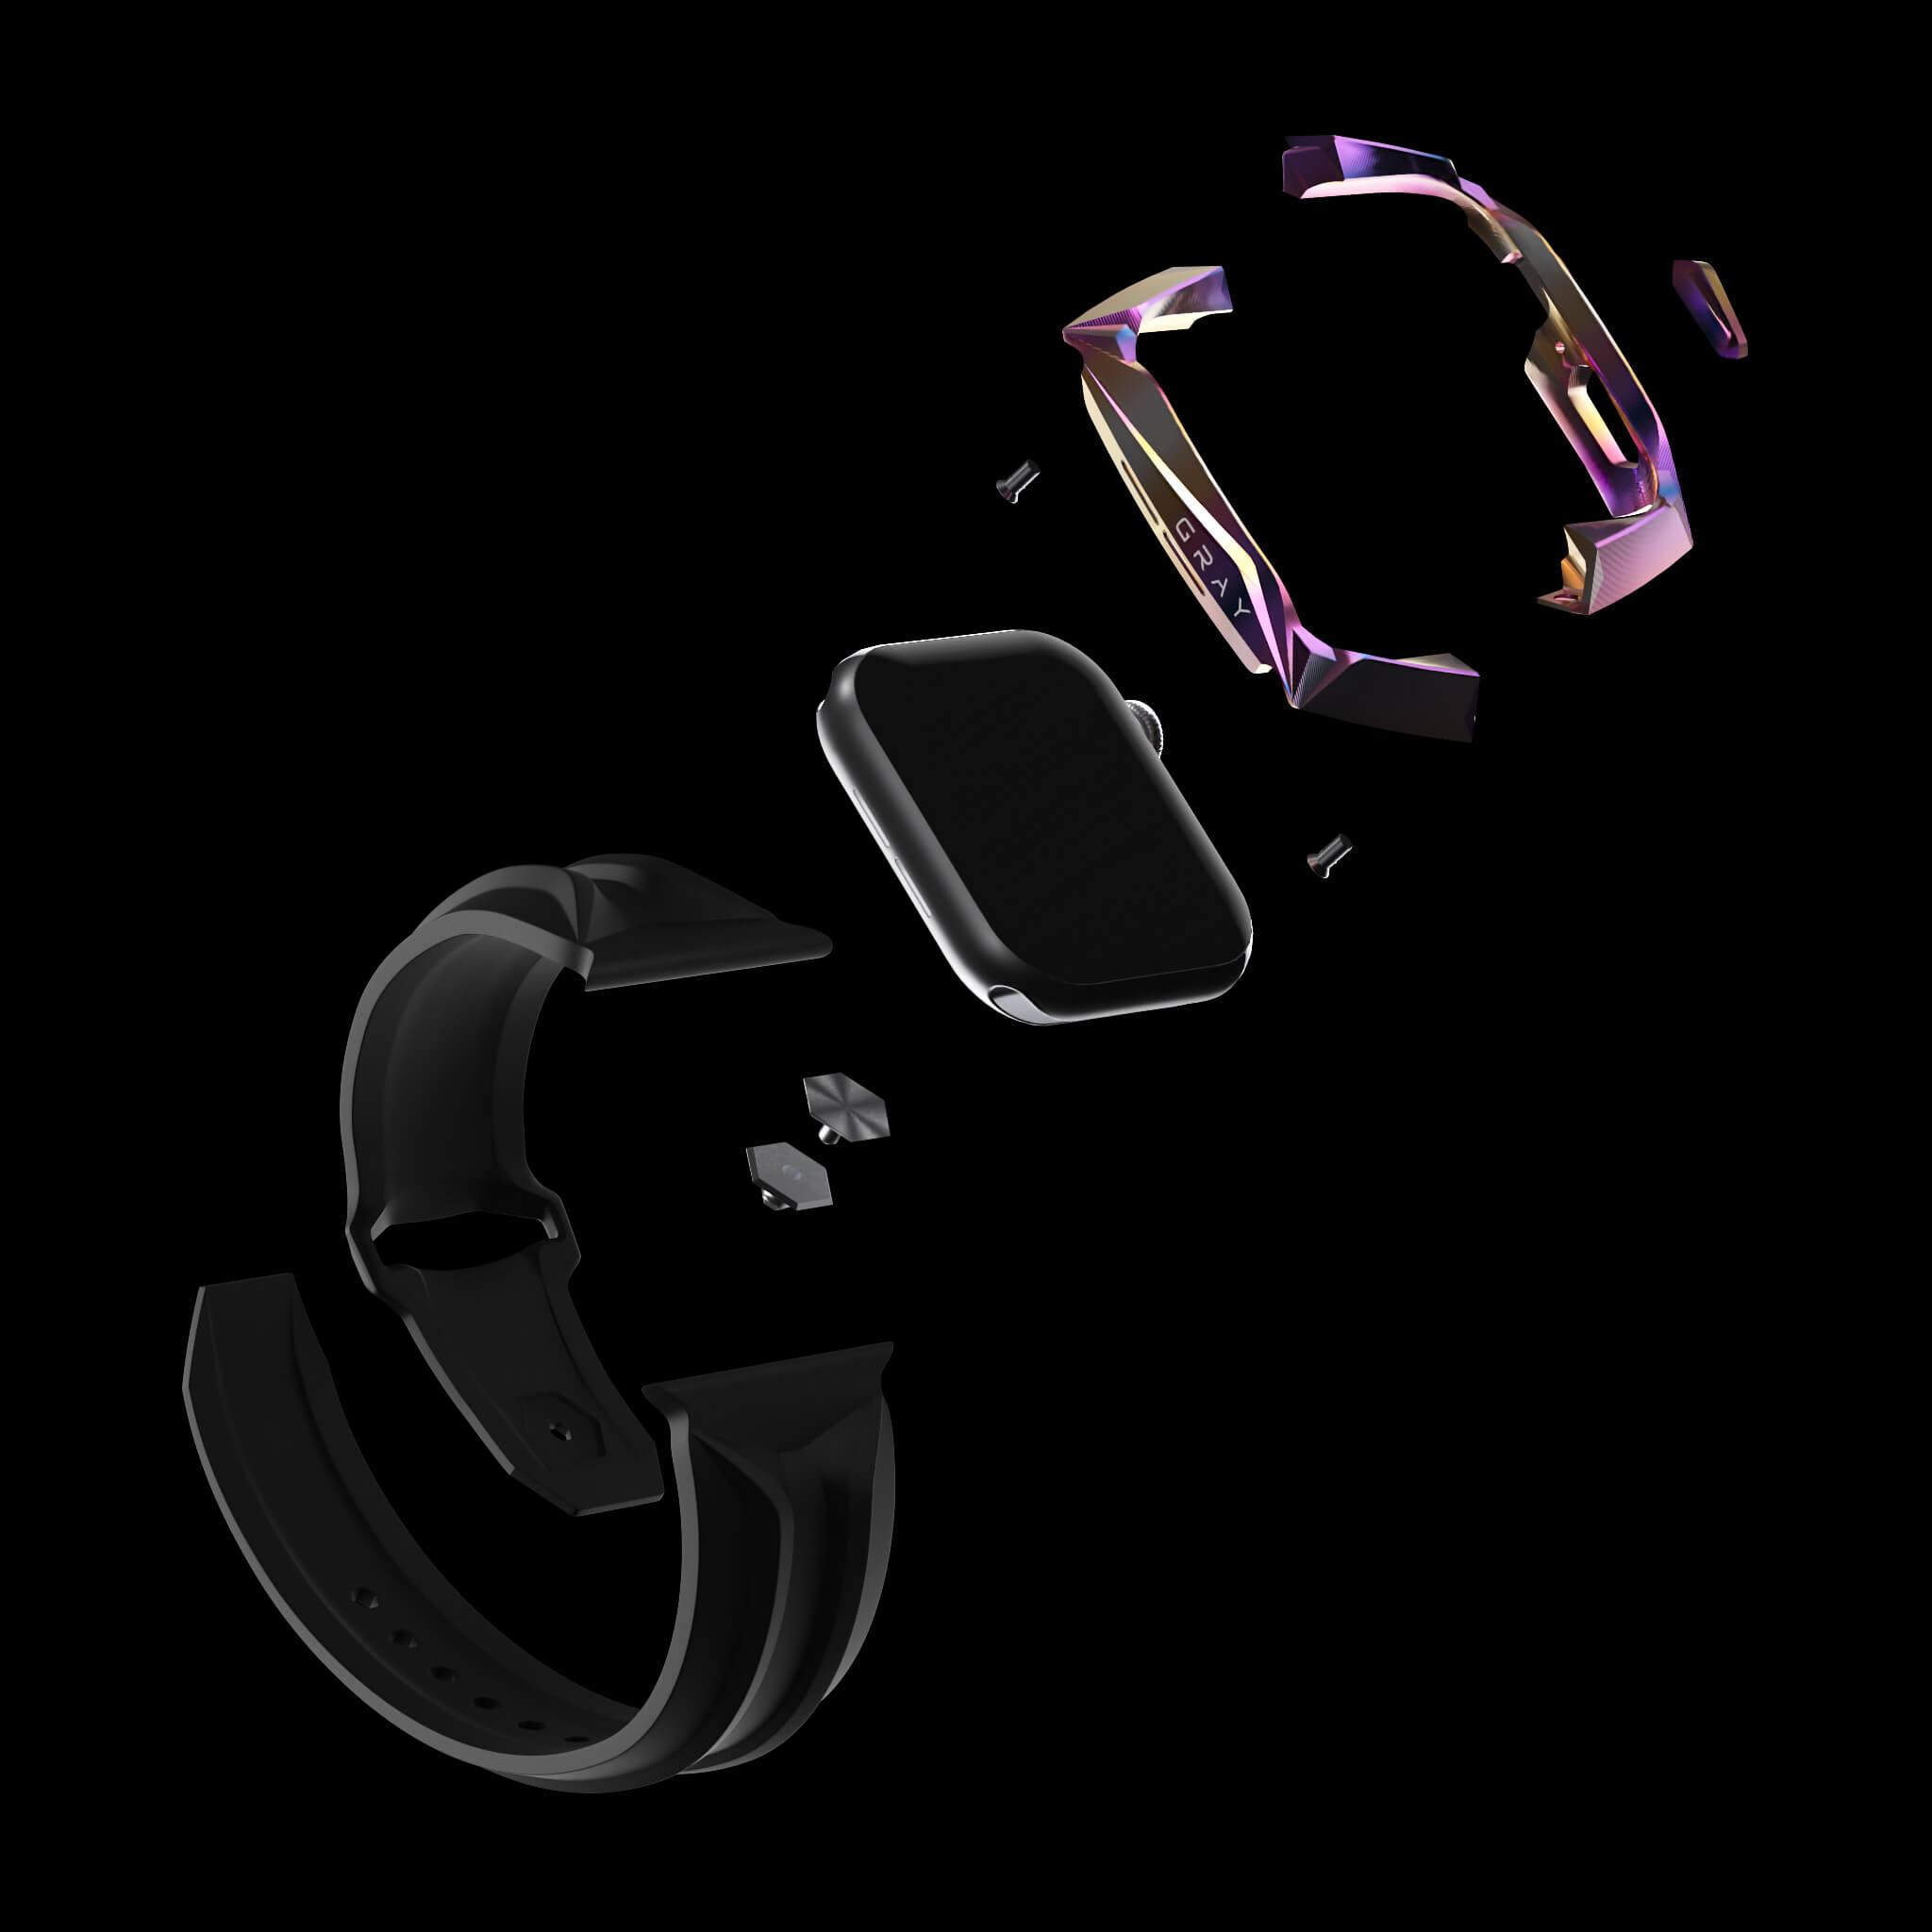 reskar aurora titanium metal apple watch case